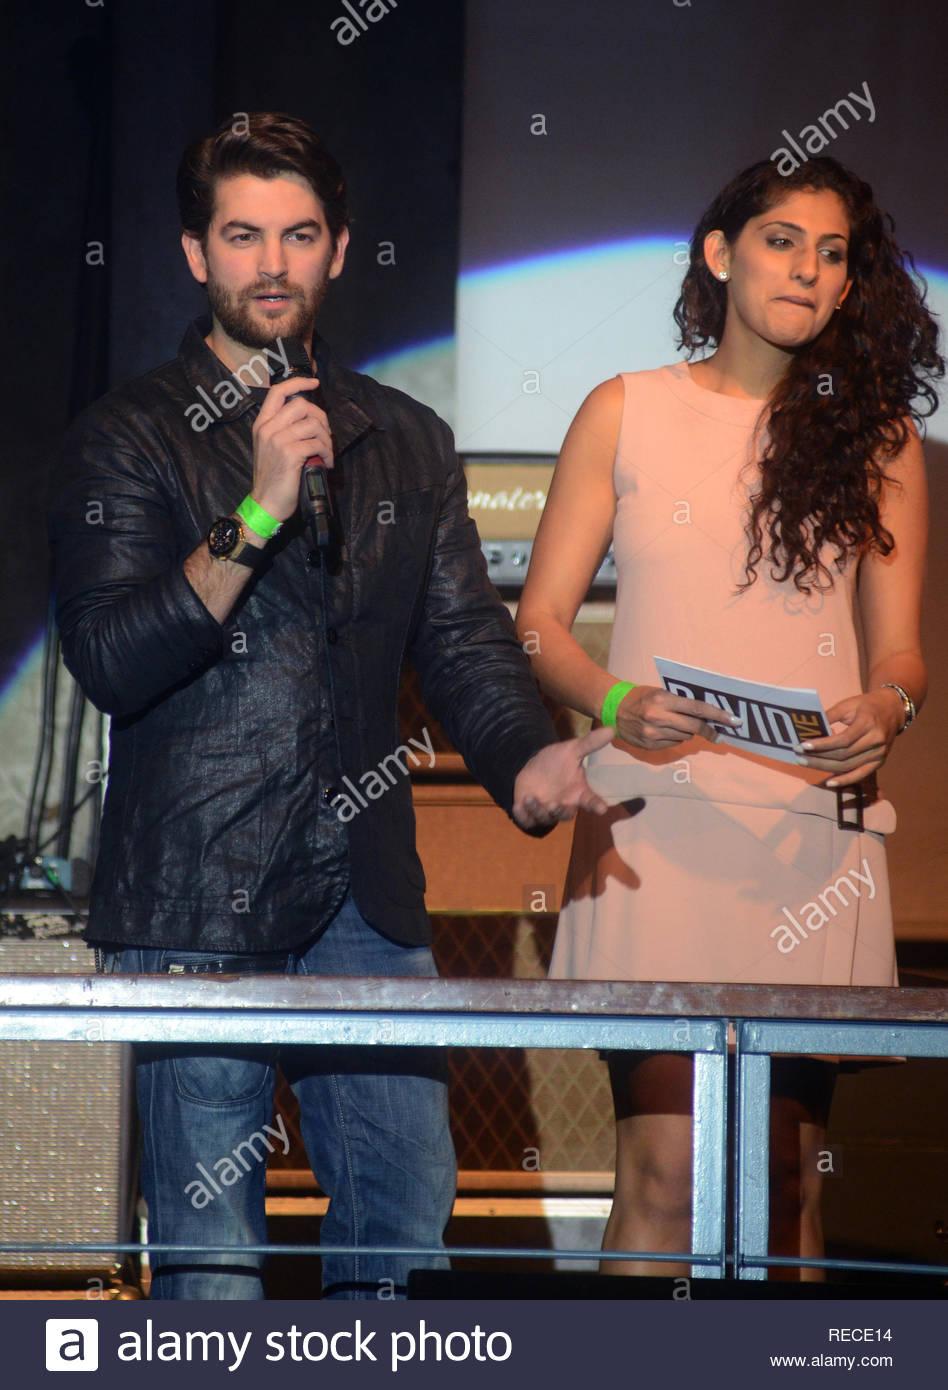 Bollywood actor Neil Nitin Mukesh during the music launch of upcoming film David in Mumbai, India on January 14, 2013. (Shripad Naik/ SOLARIS IMAGES) Stock Photo